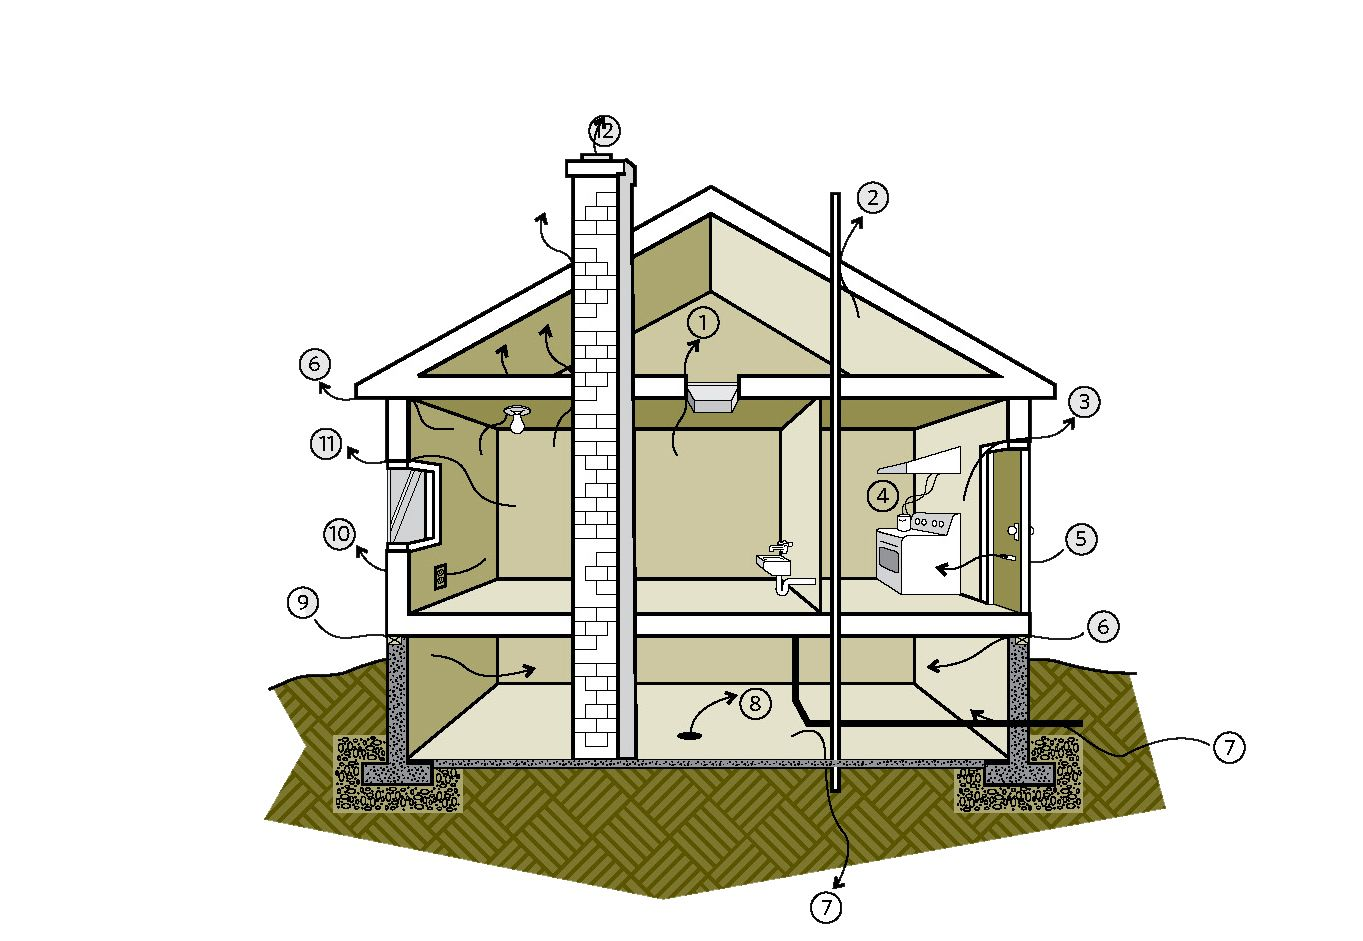 Sealing air leaks in home Air leaks, Home improvement